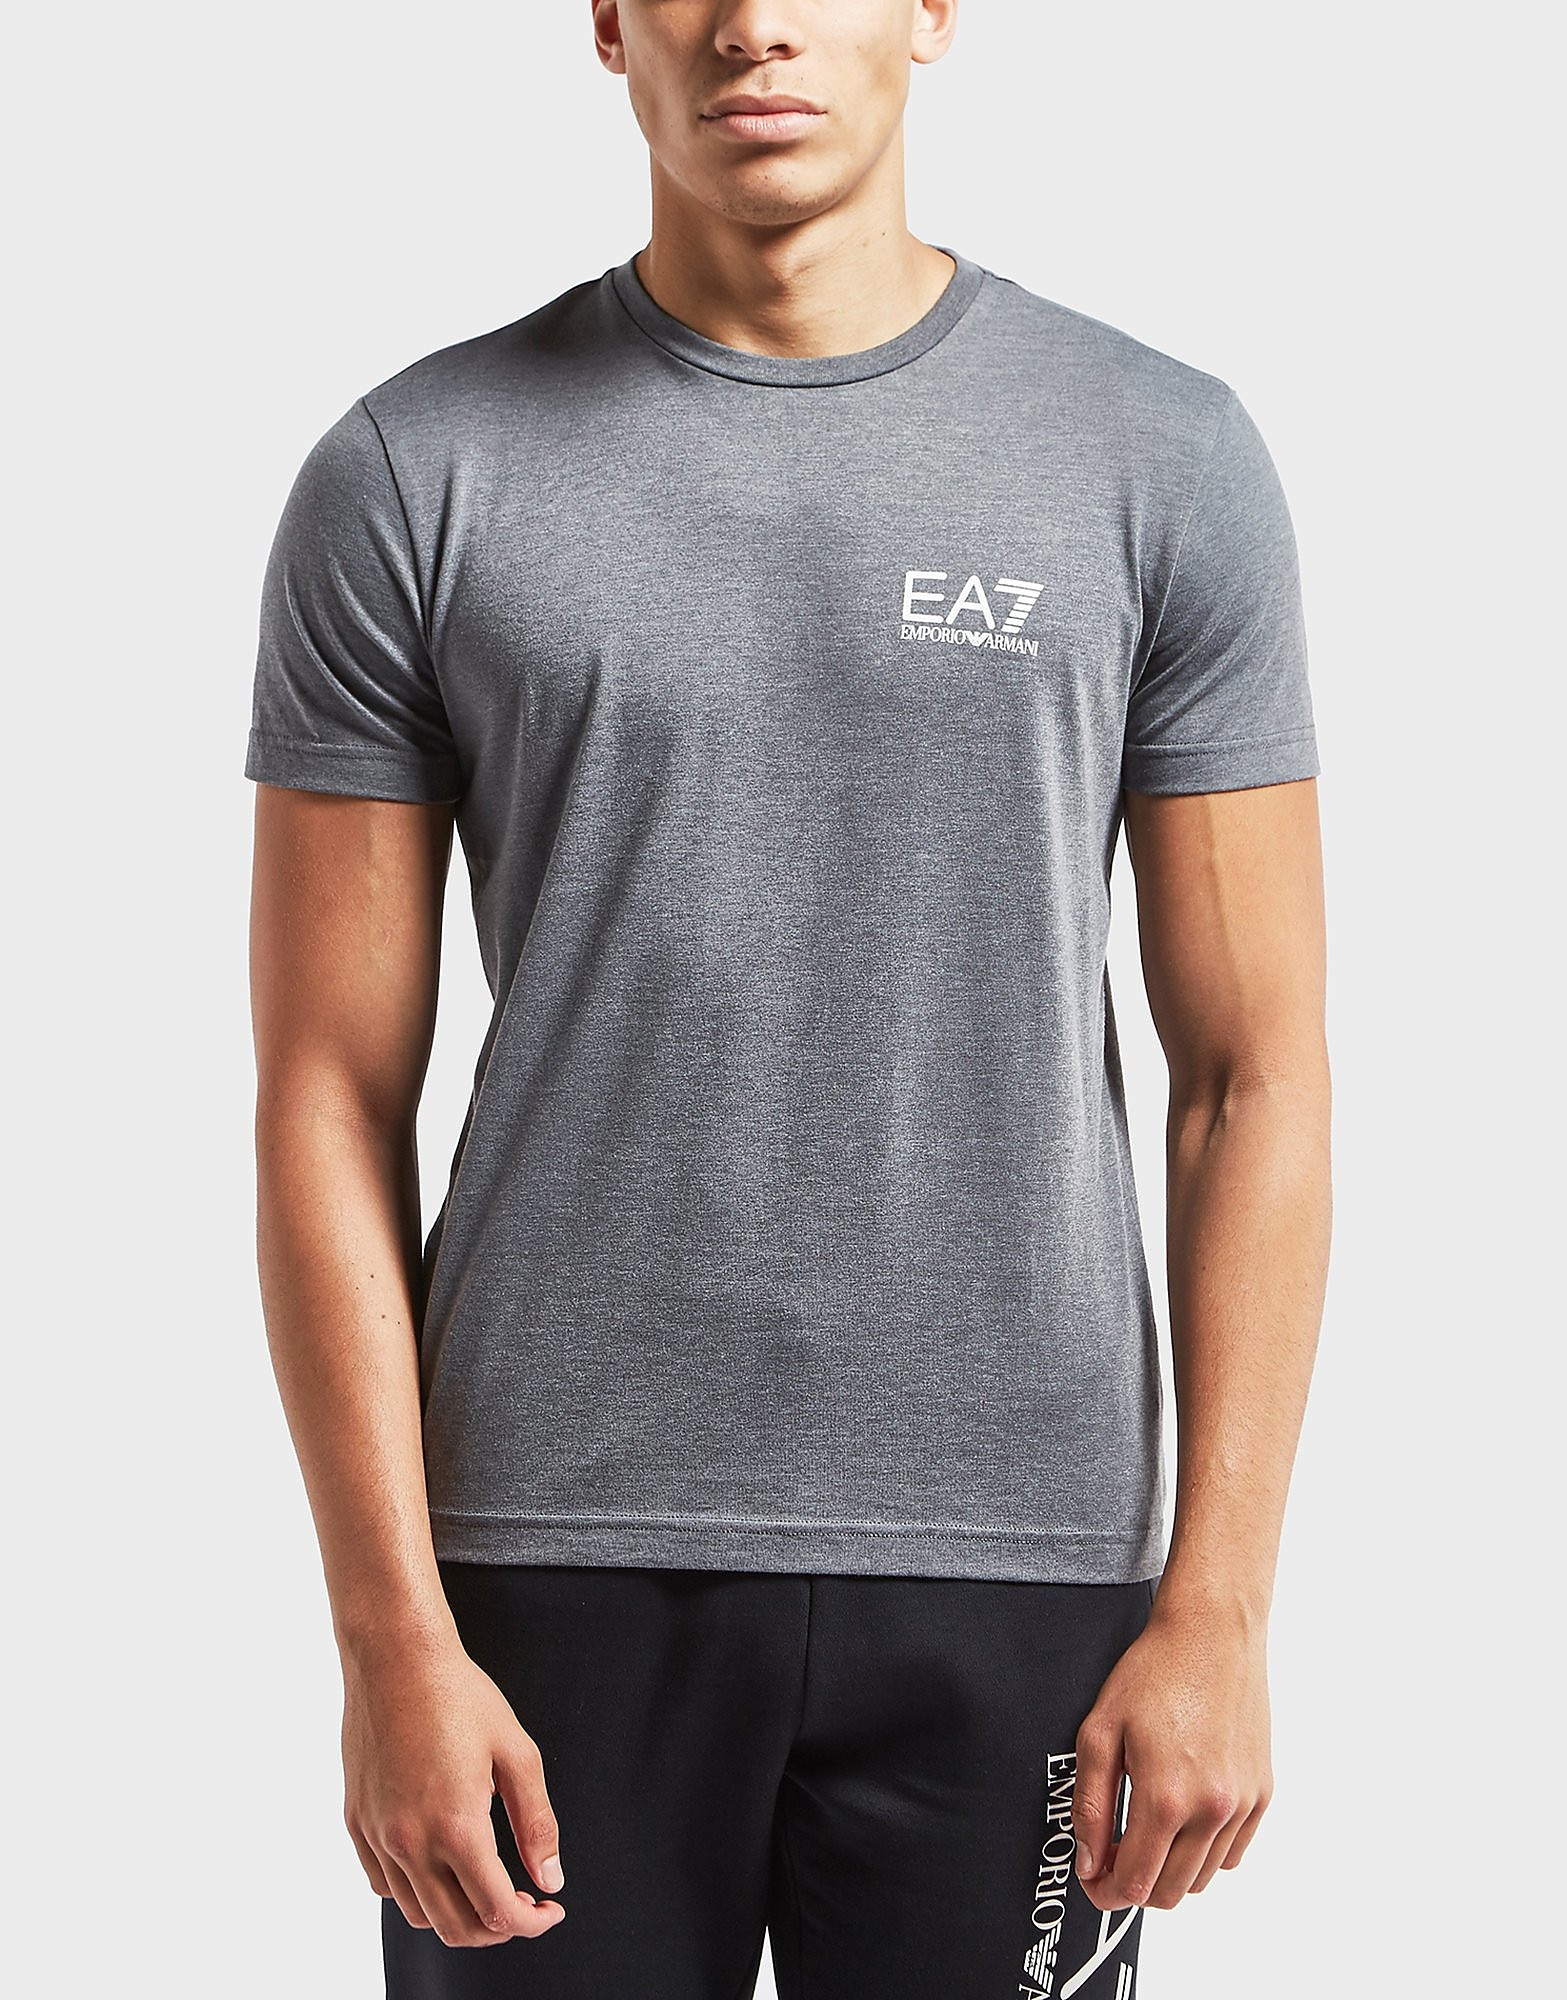 Emporio Armani EA7 Core Crew Short Sleeve T-Shirt